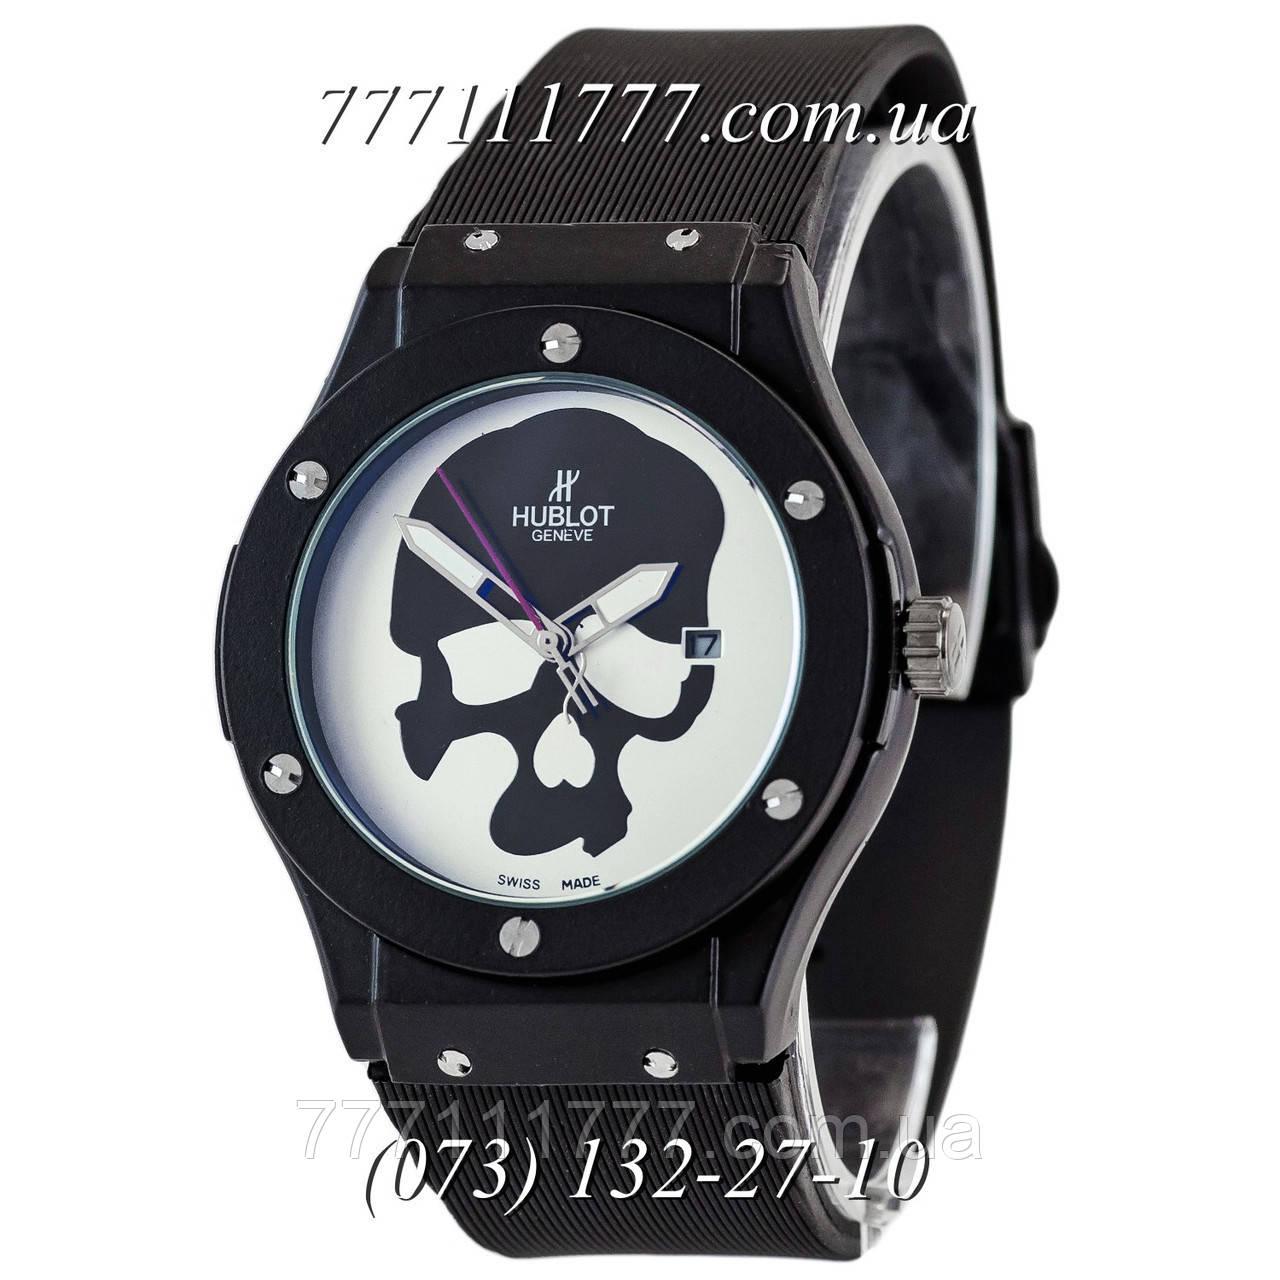 edd9cef3 Часы мужские наручные Hublot Classic Fusion Skull Quartz Black-Black-White